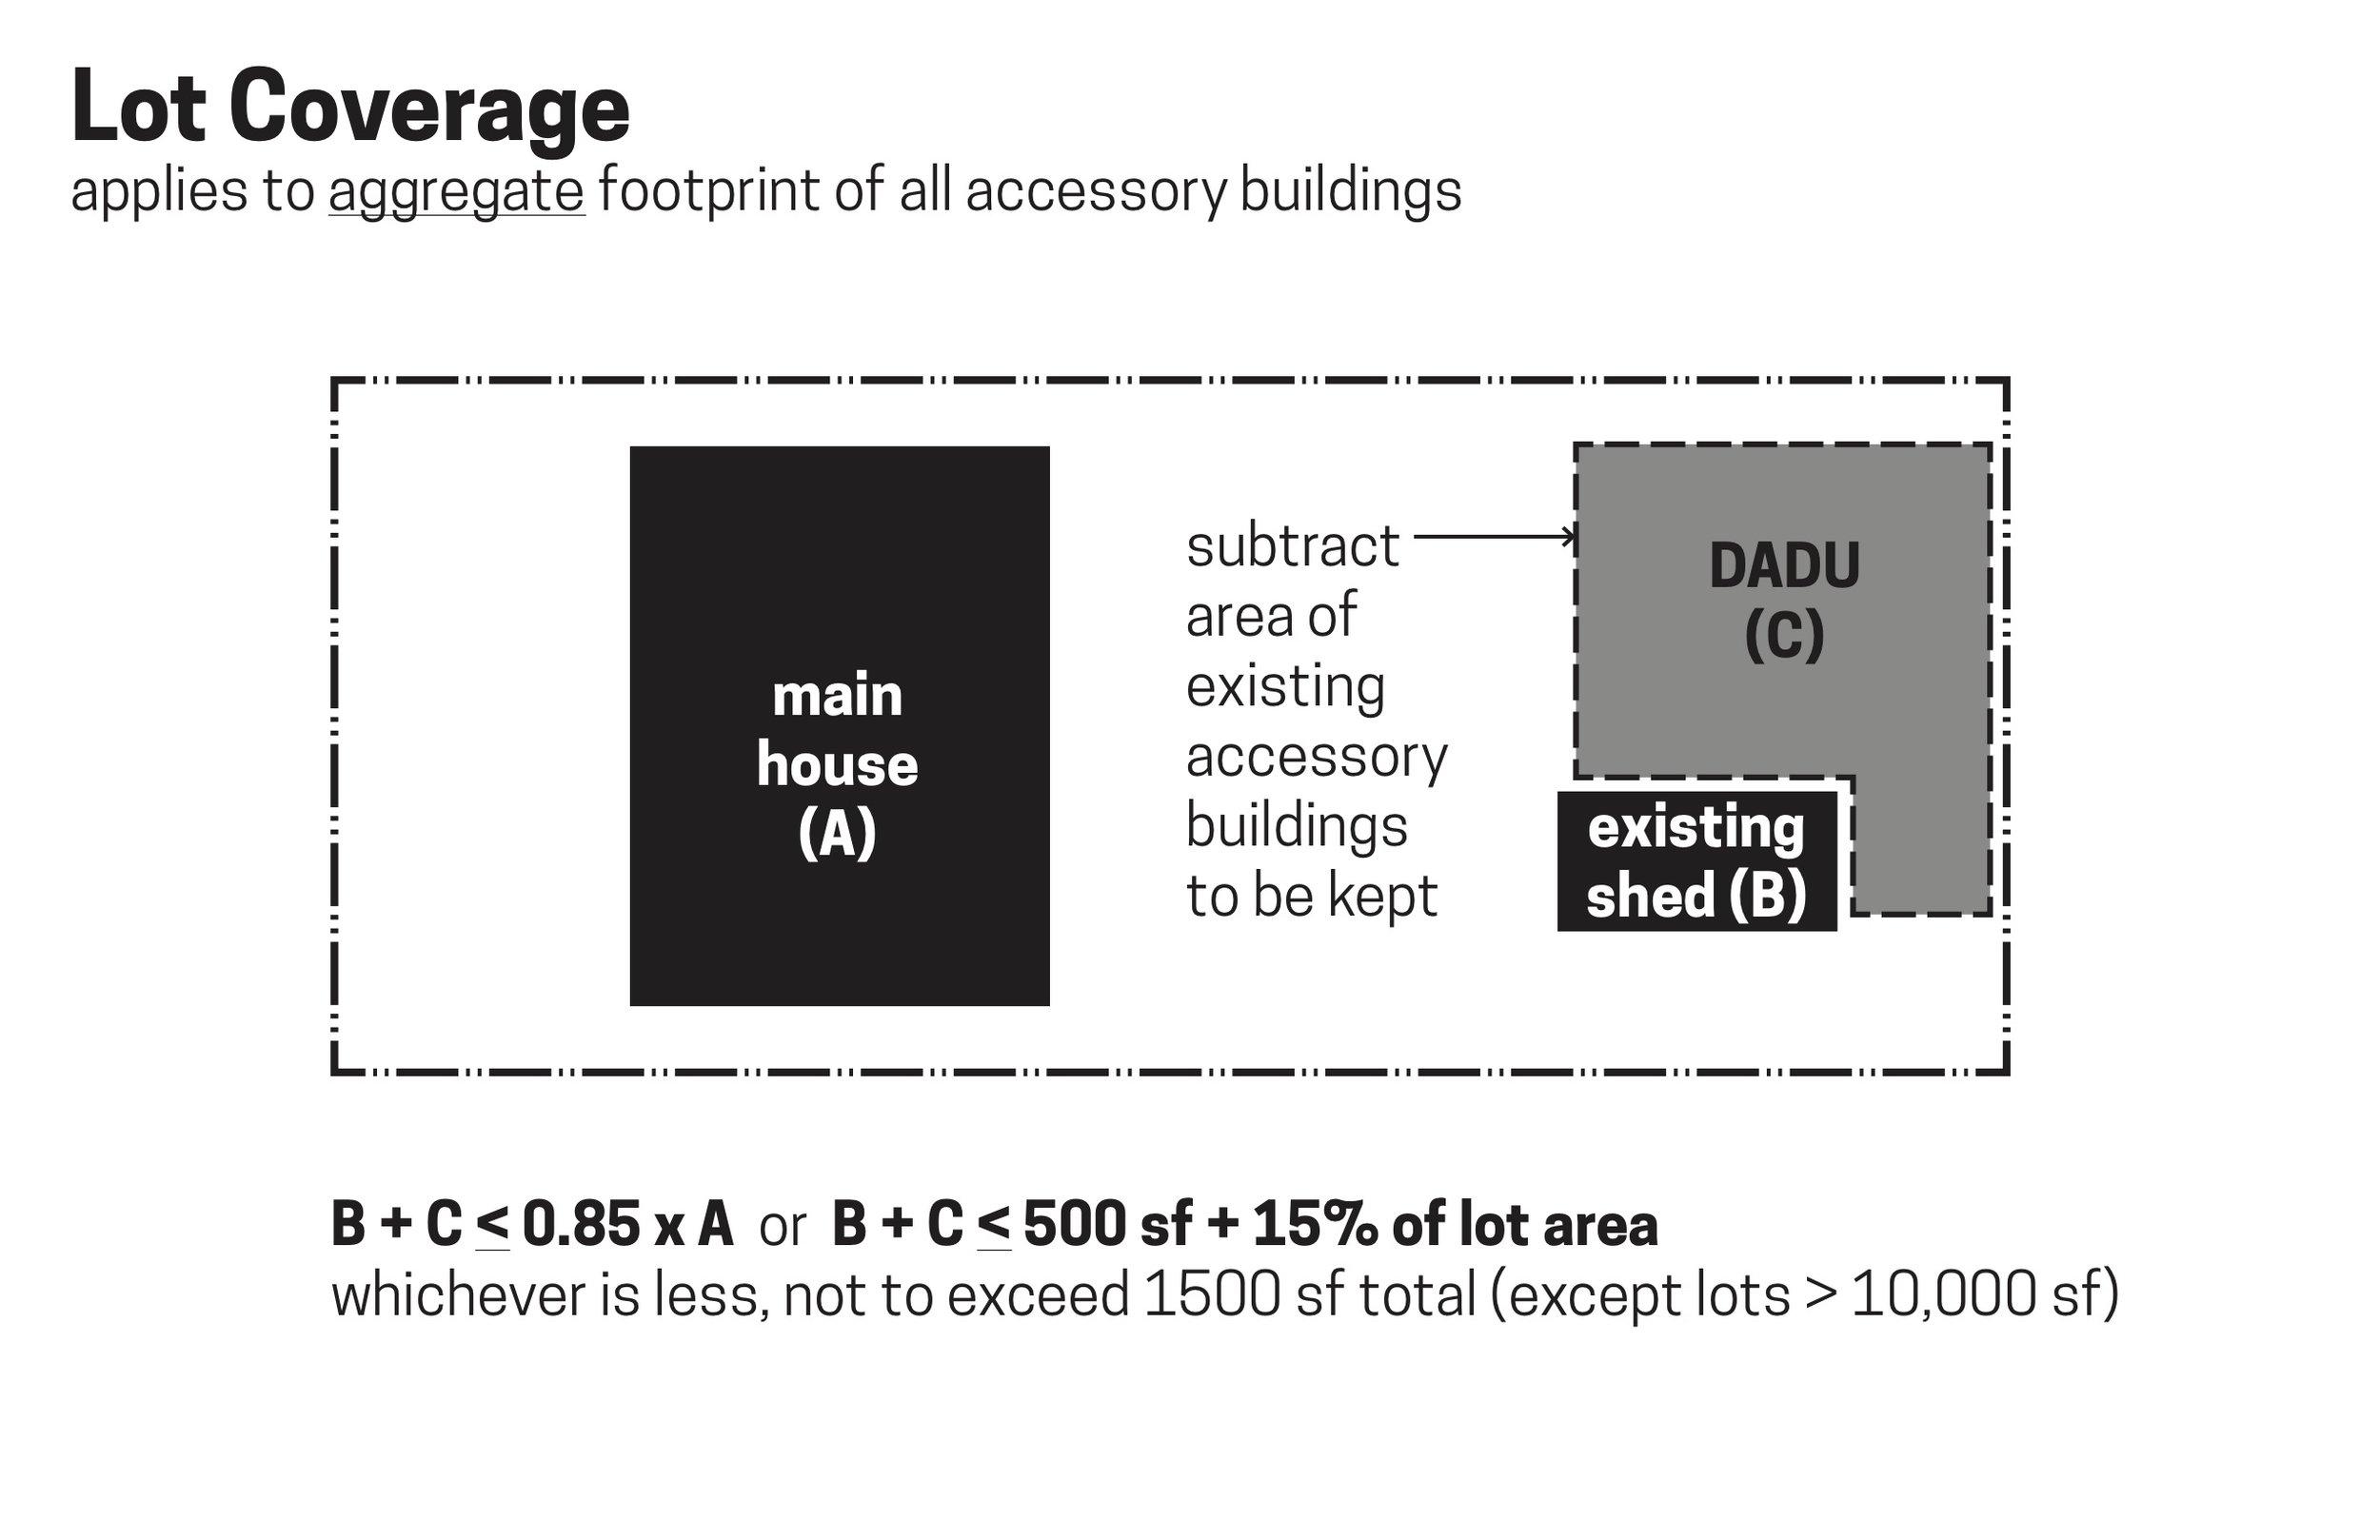 wc-studio-DADU-lot-coverage-total-accessory-building-area.jpg